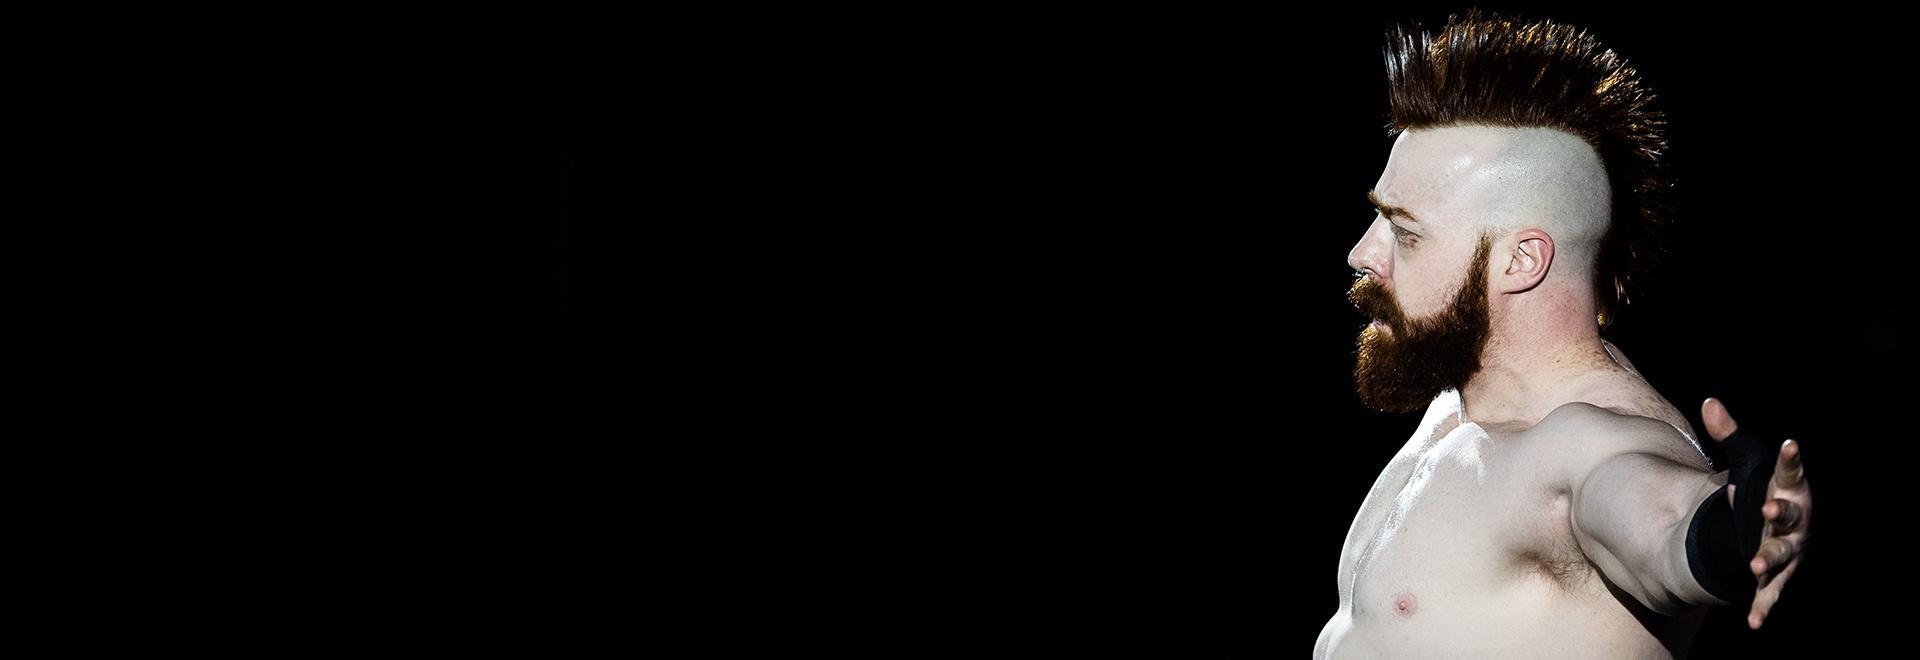 Ep. 45